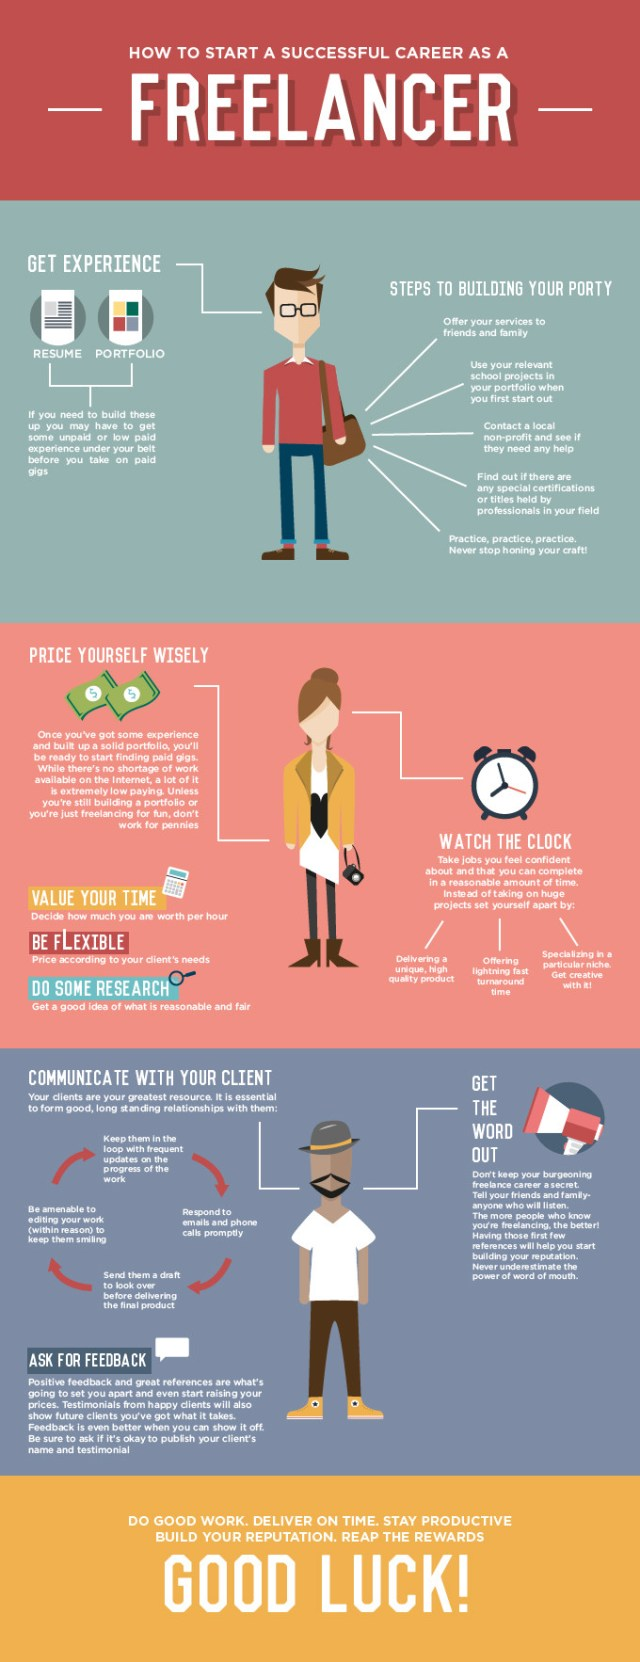 Successful Freelancer info